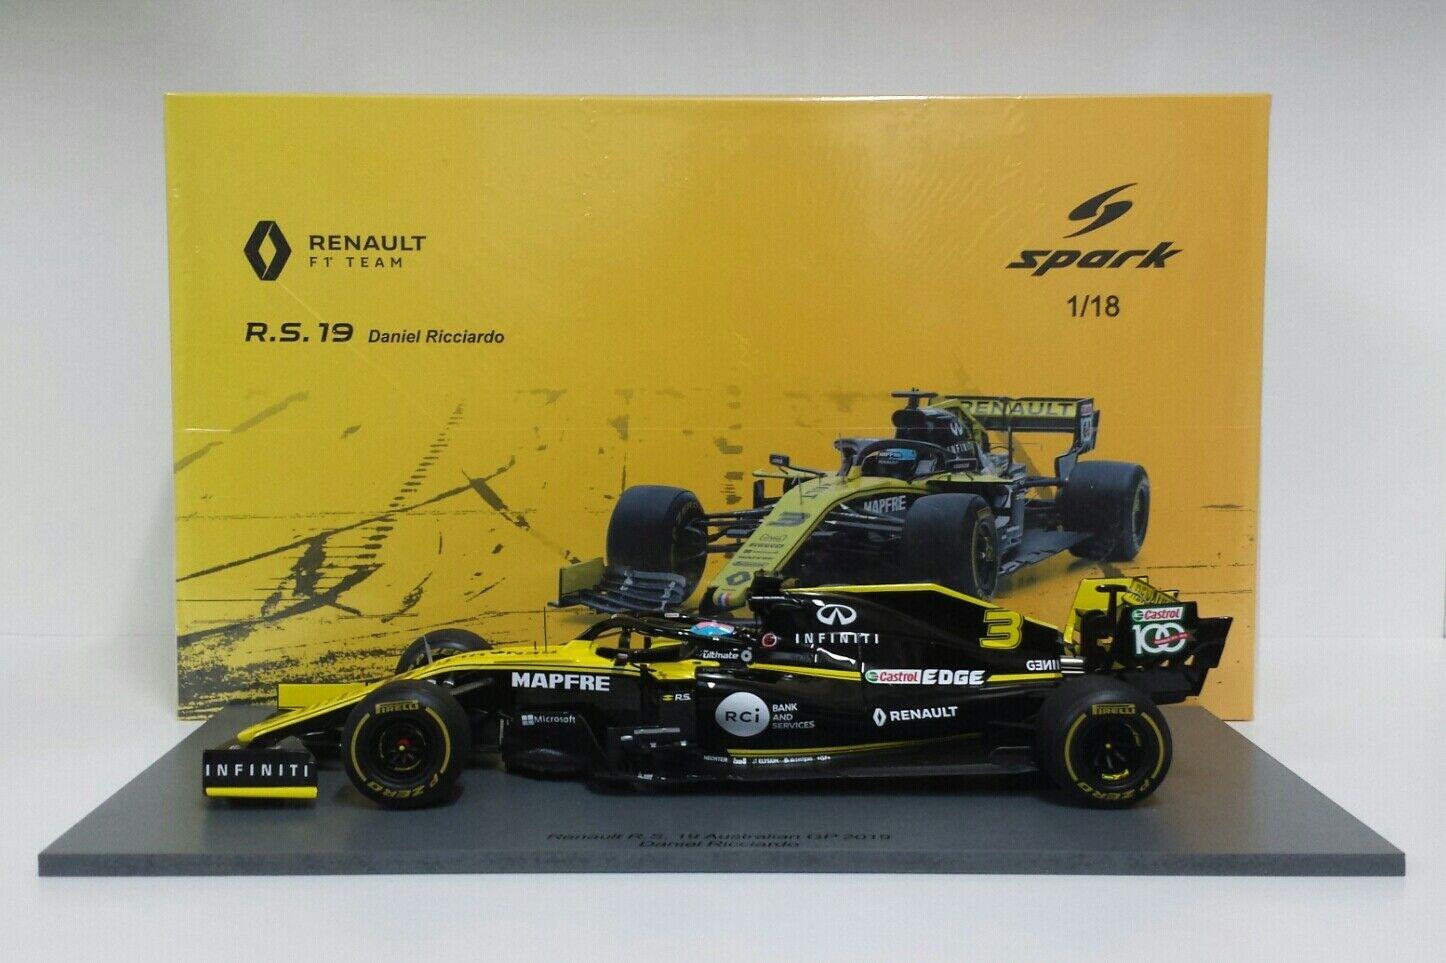 SPARK 1/18 MODELLINO DIECAST AUTO F1 RENAULT R.S.19 RICCIARDO GP AUSTRALIA 2019